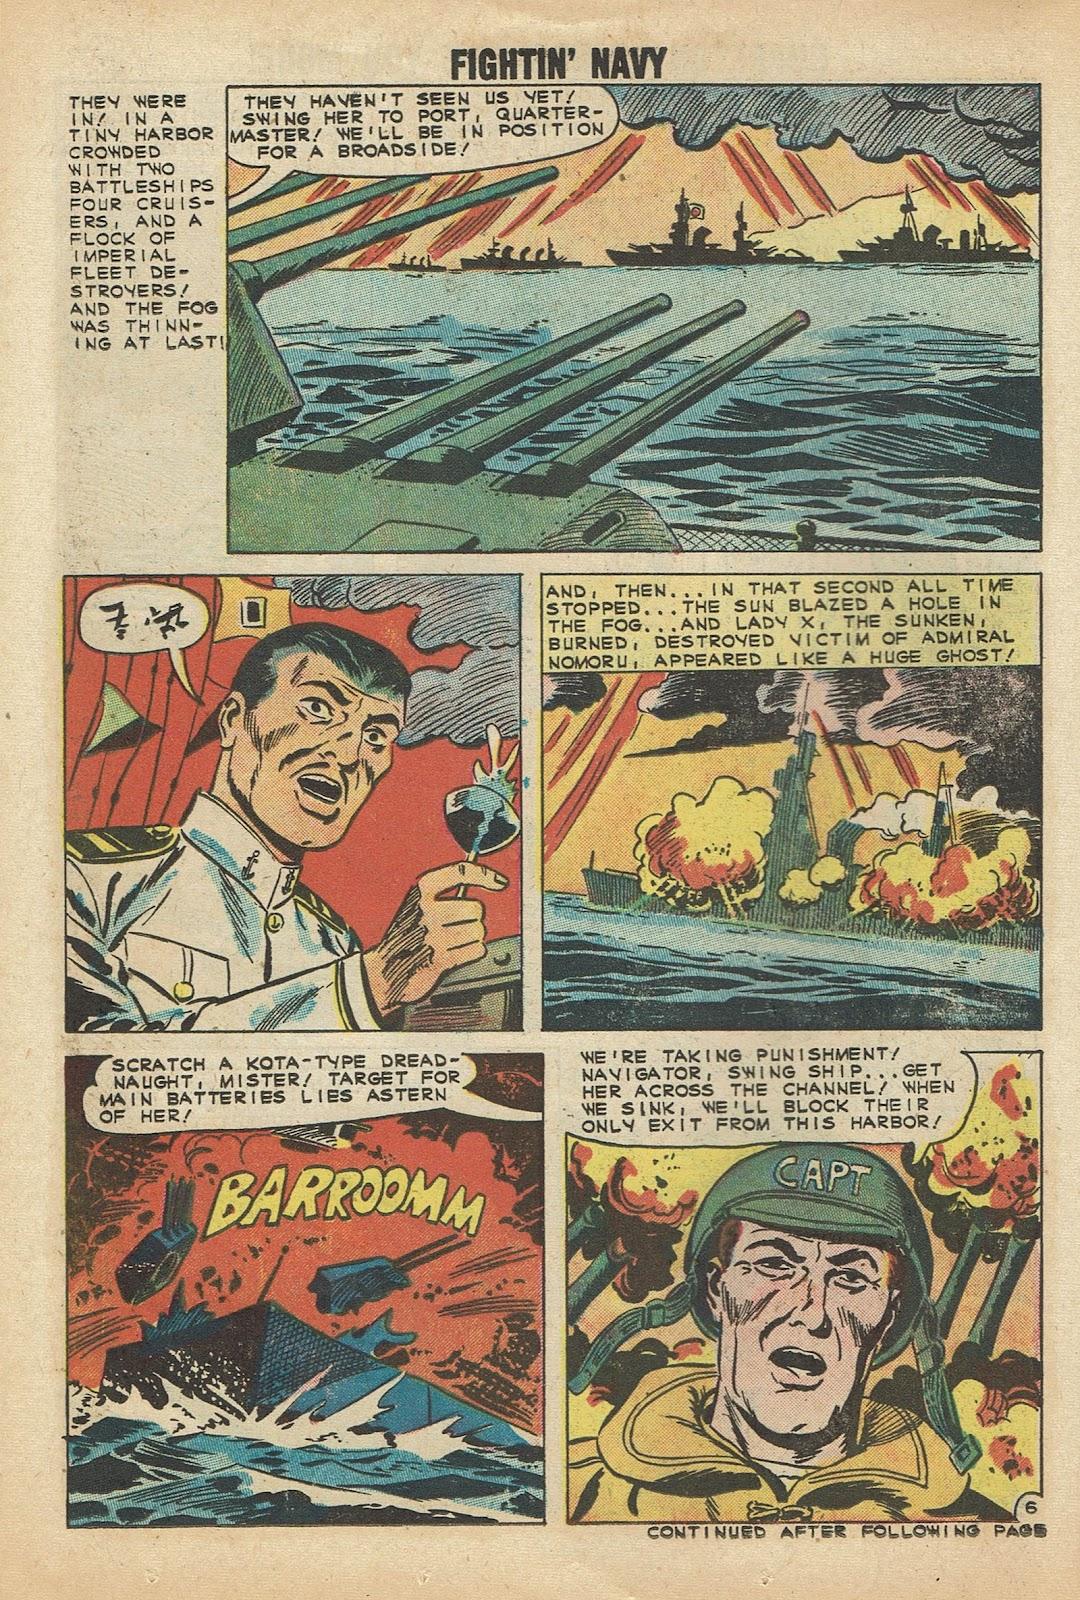 Read online Fightin' Navy comic -  Issue #97 - 14